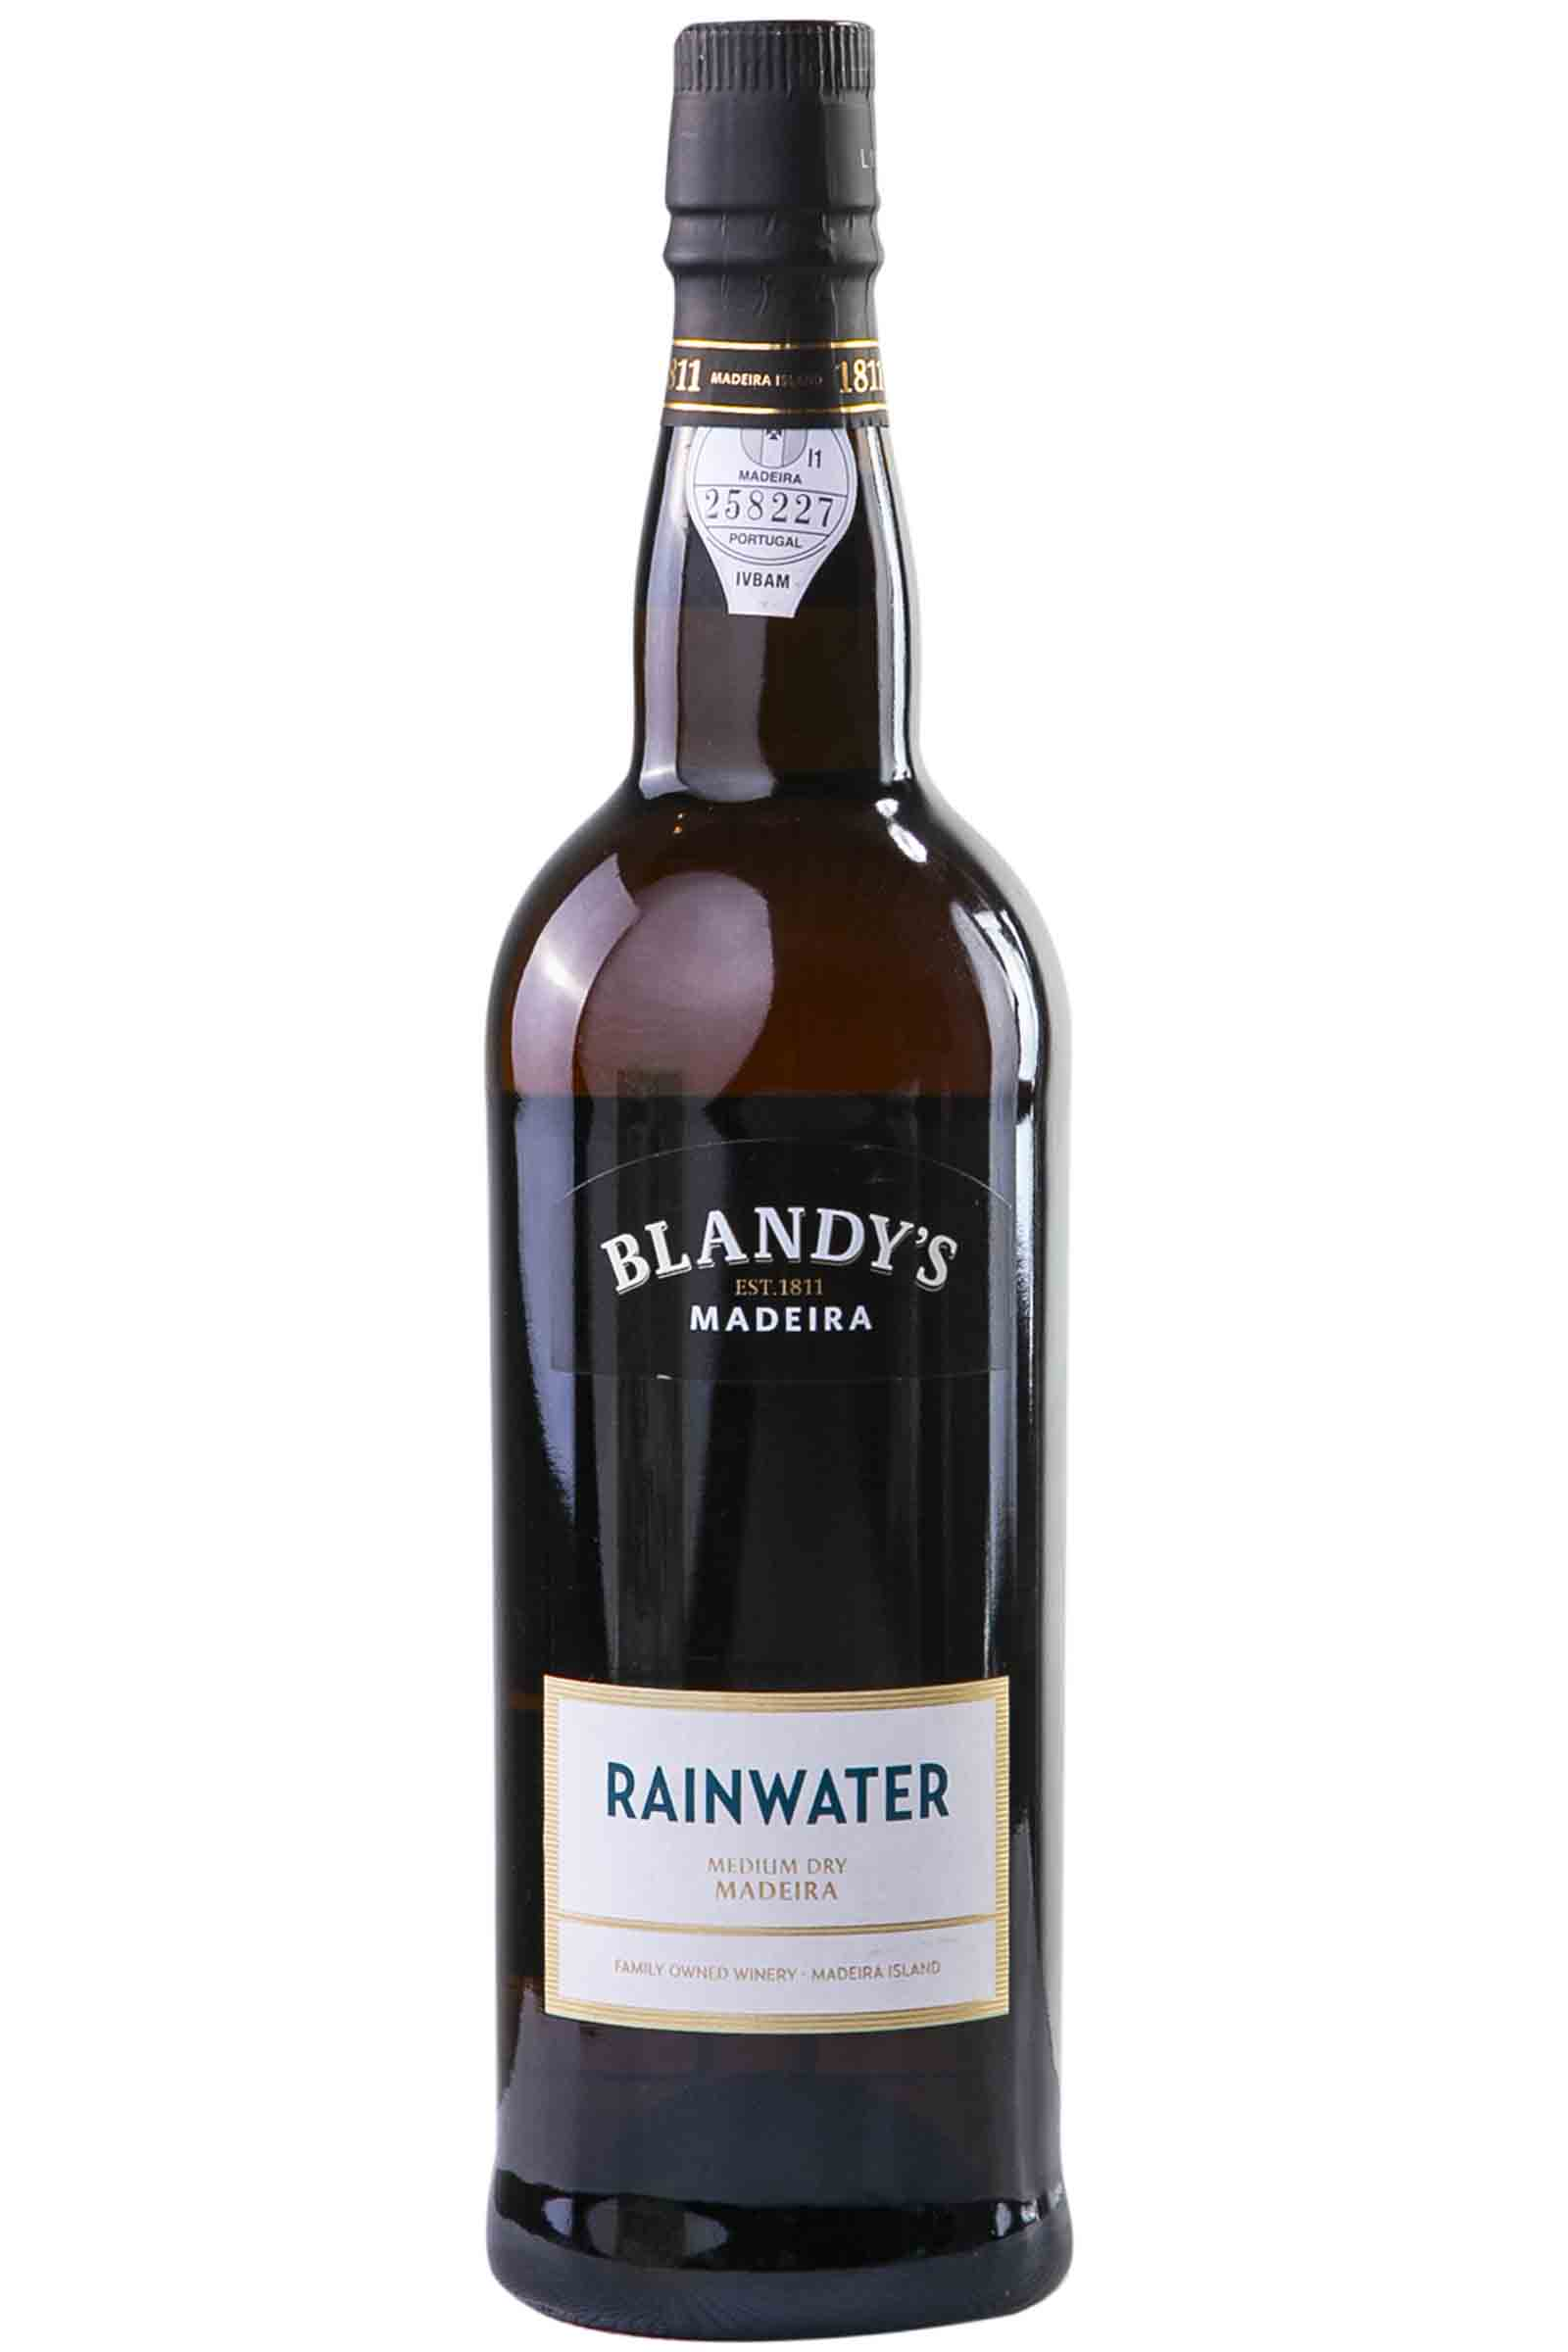 Oporto Blandy's Rainwater Madeira 750ml